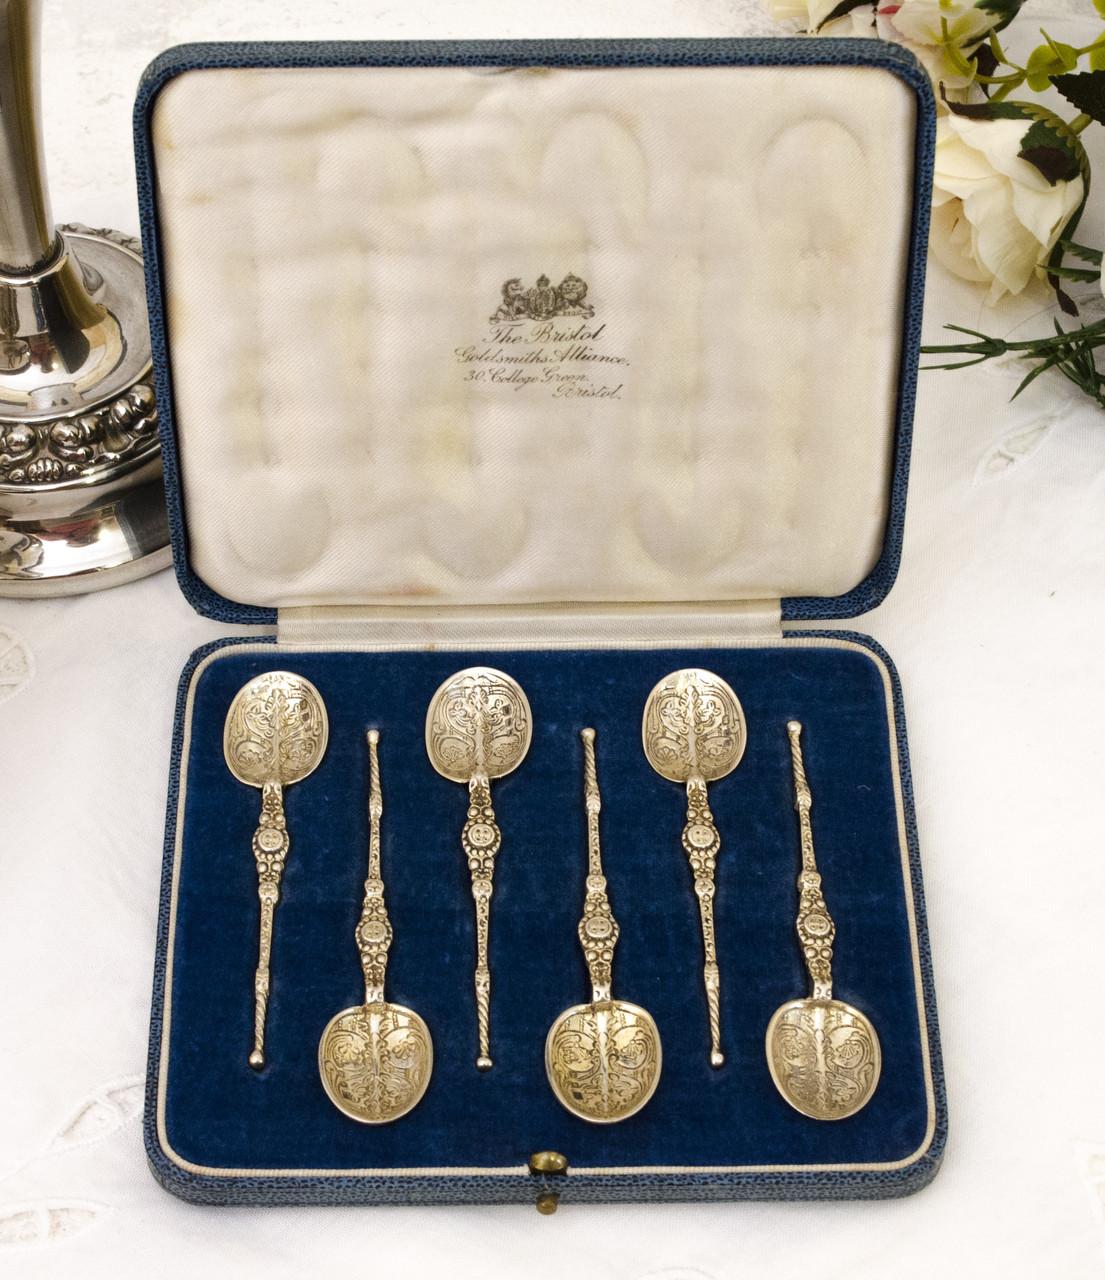 Антикварные серебряные ложки, Wakely & Wheeler LTD, Англия, London, 1936